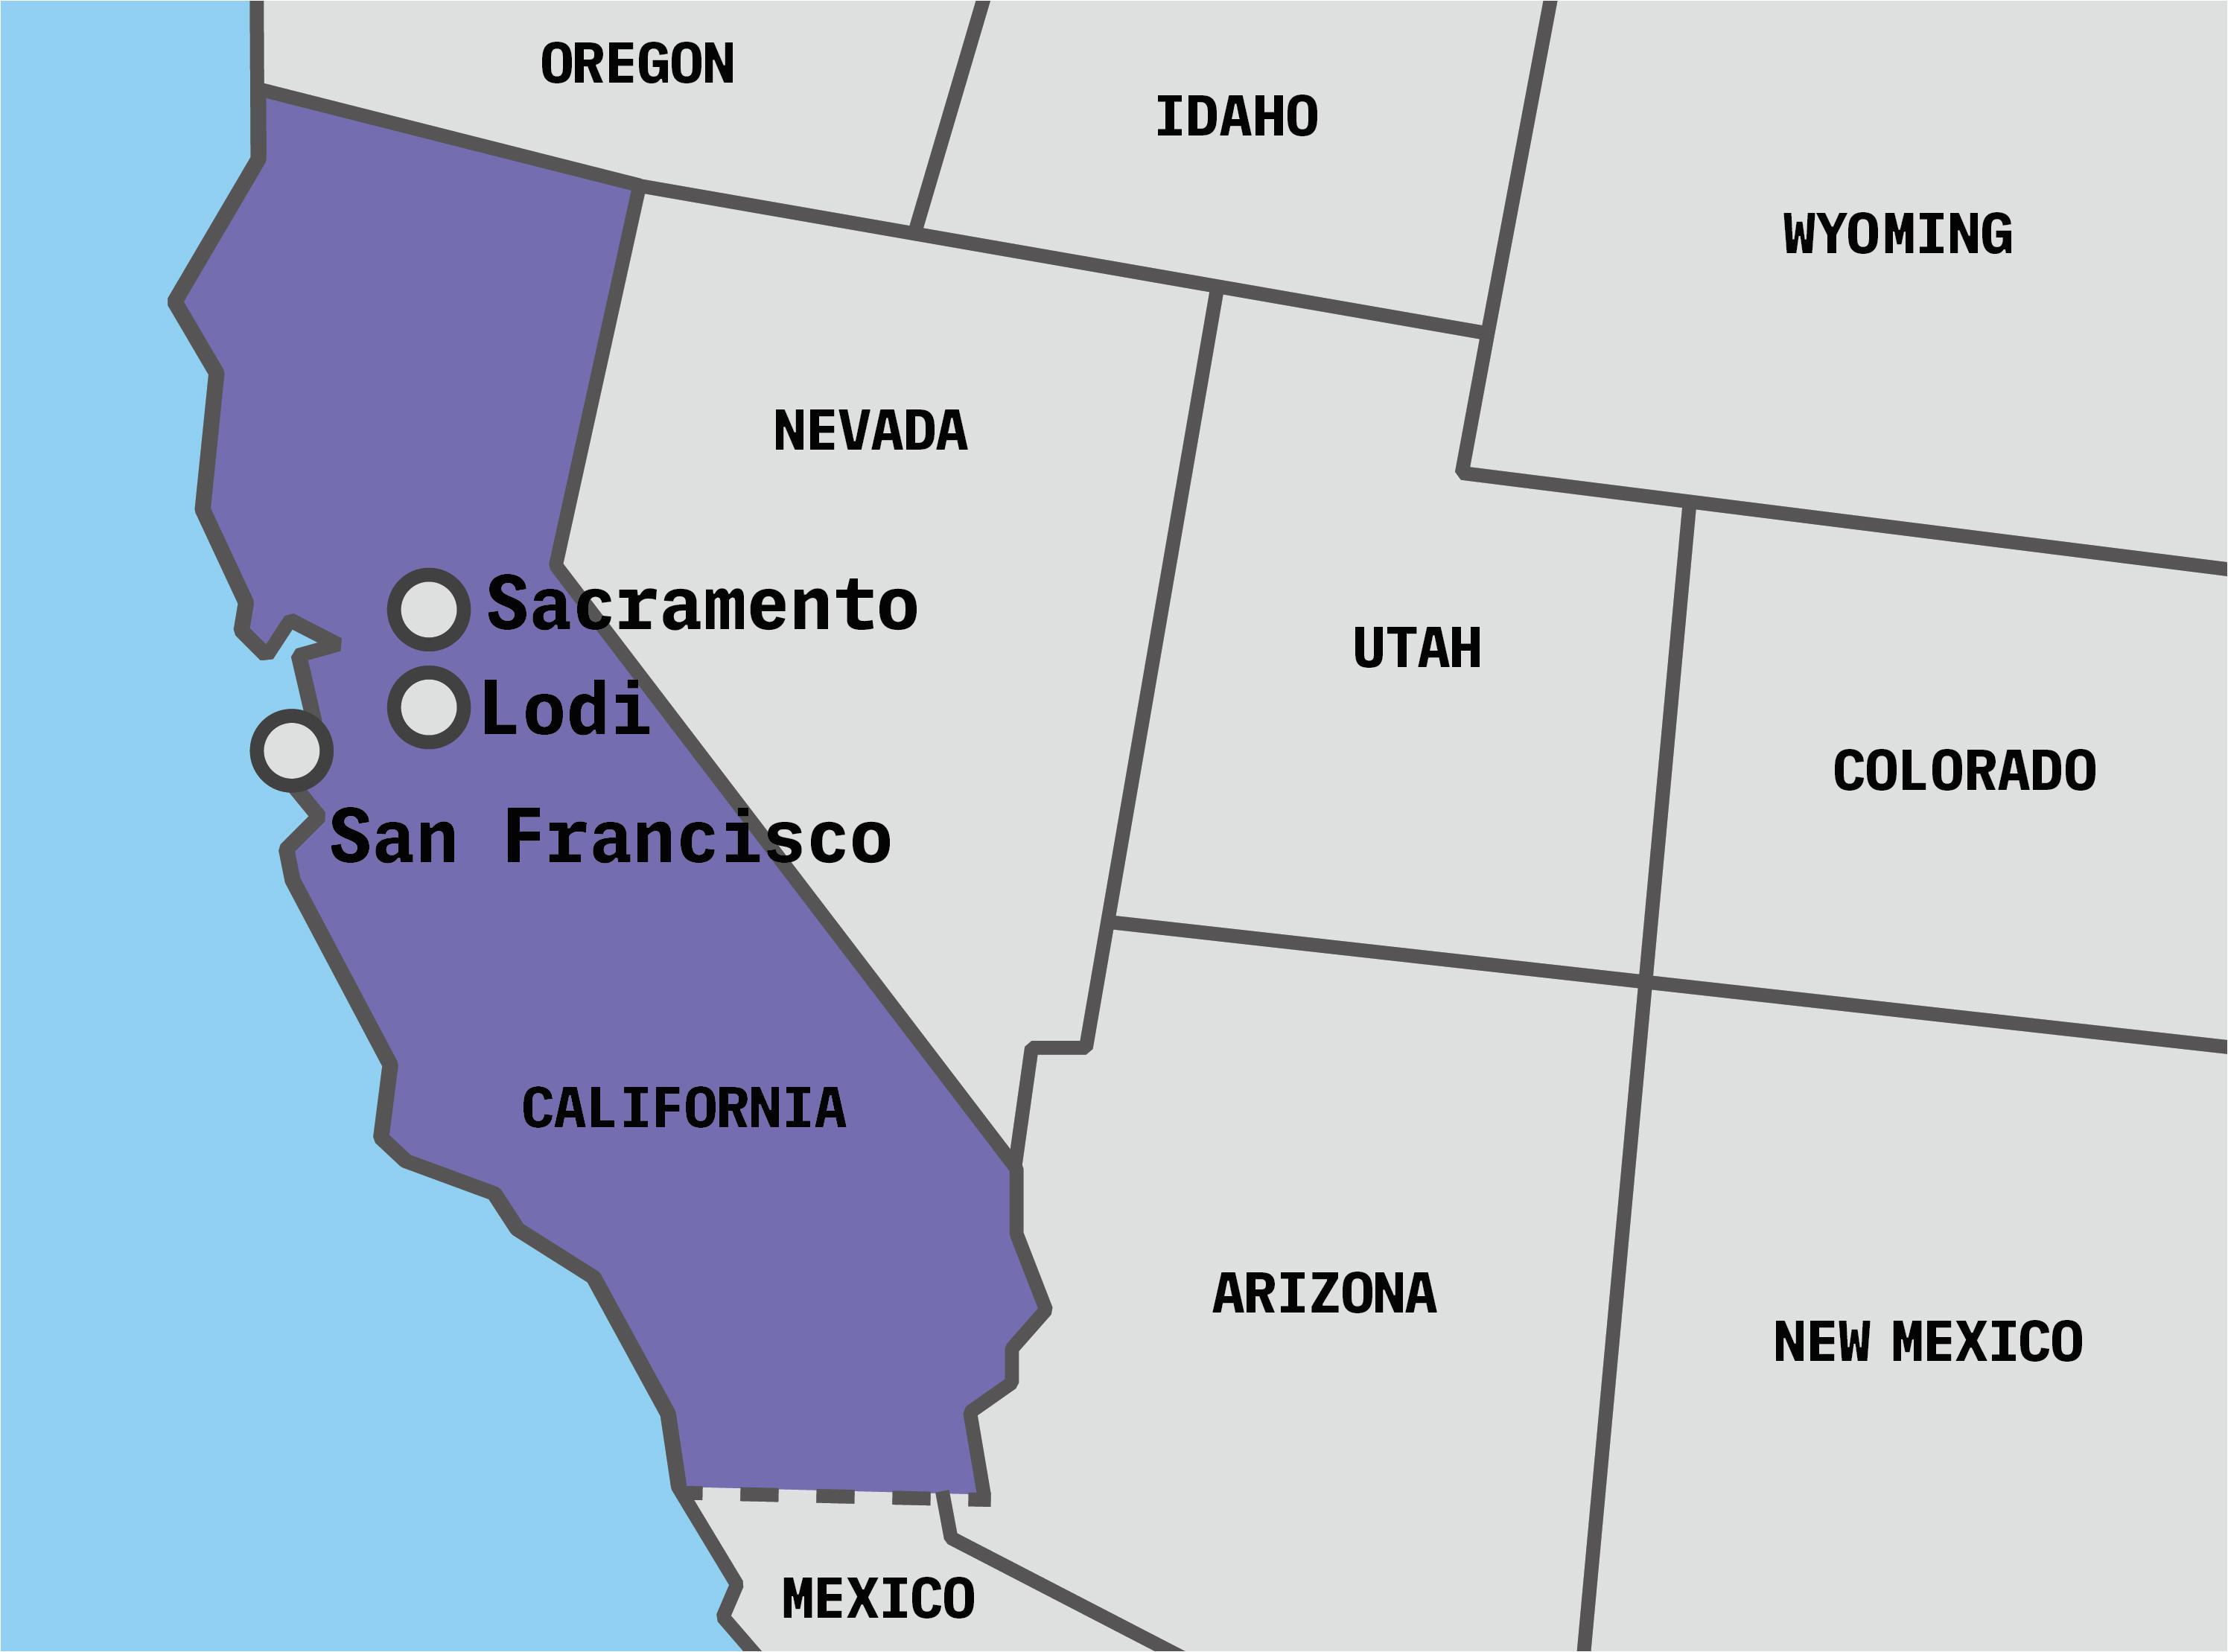 sex offender registry california map ettcarworld com